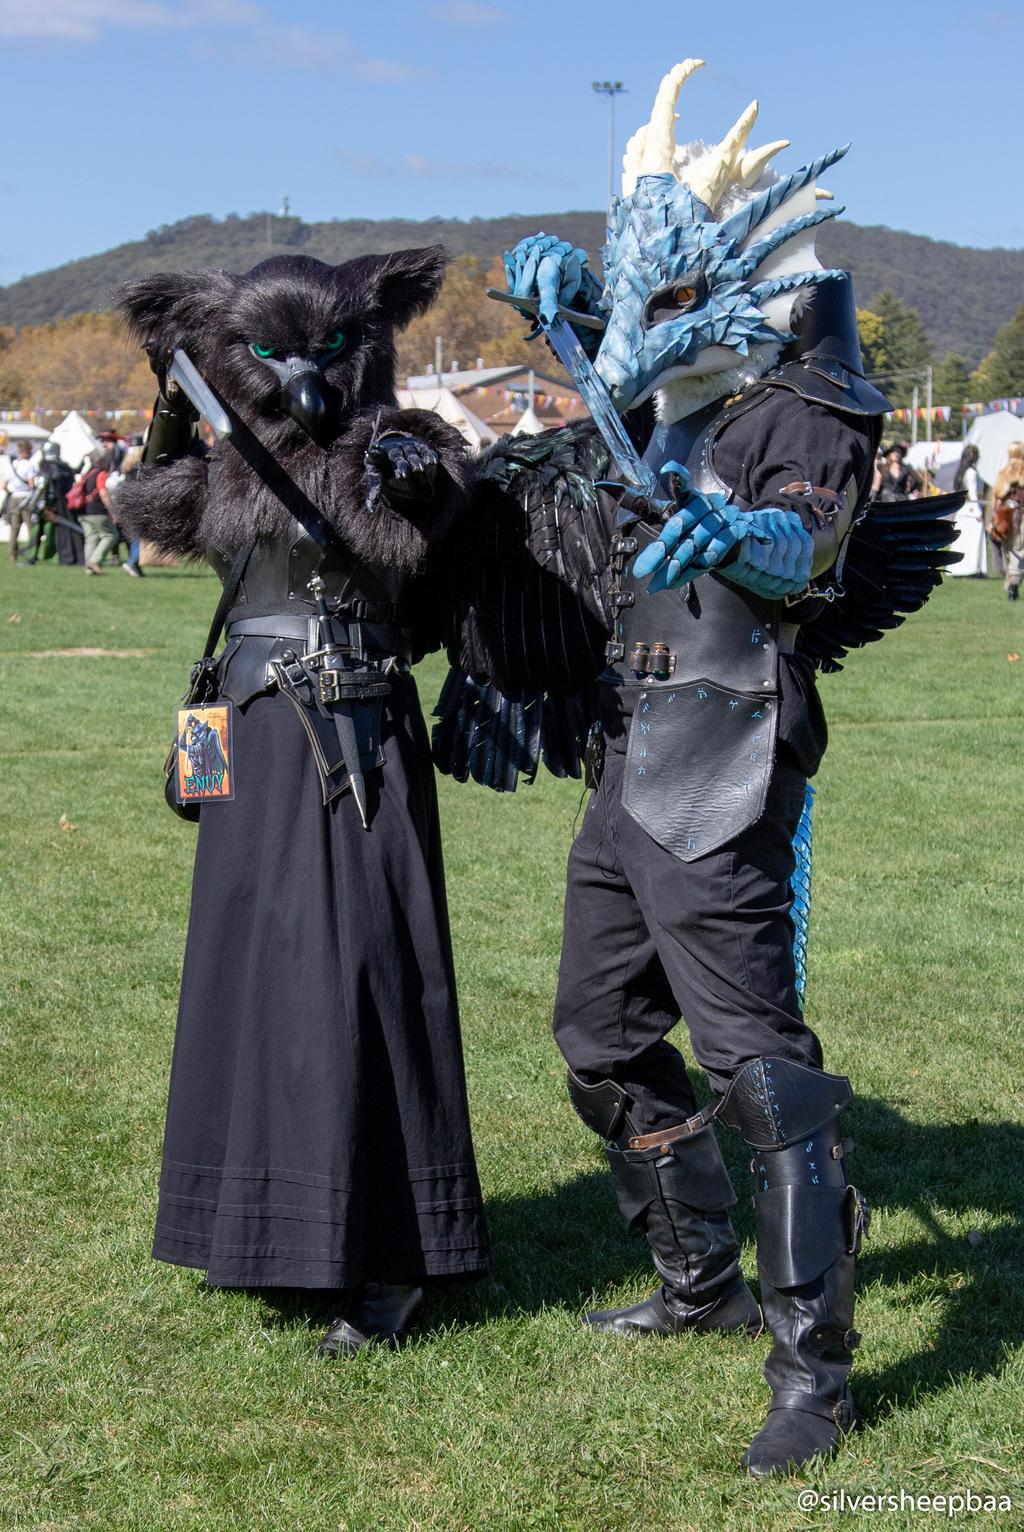 Ironfest 2019: Fierce Pair